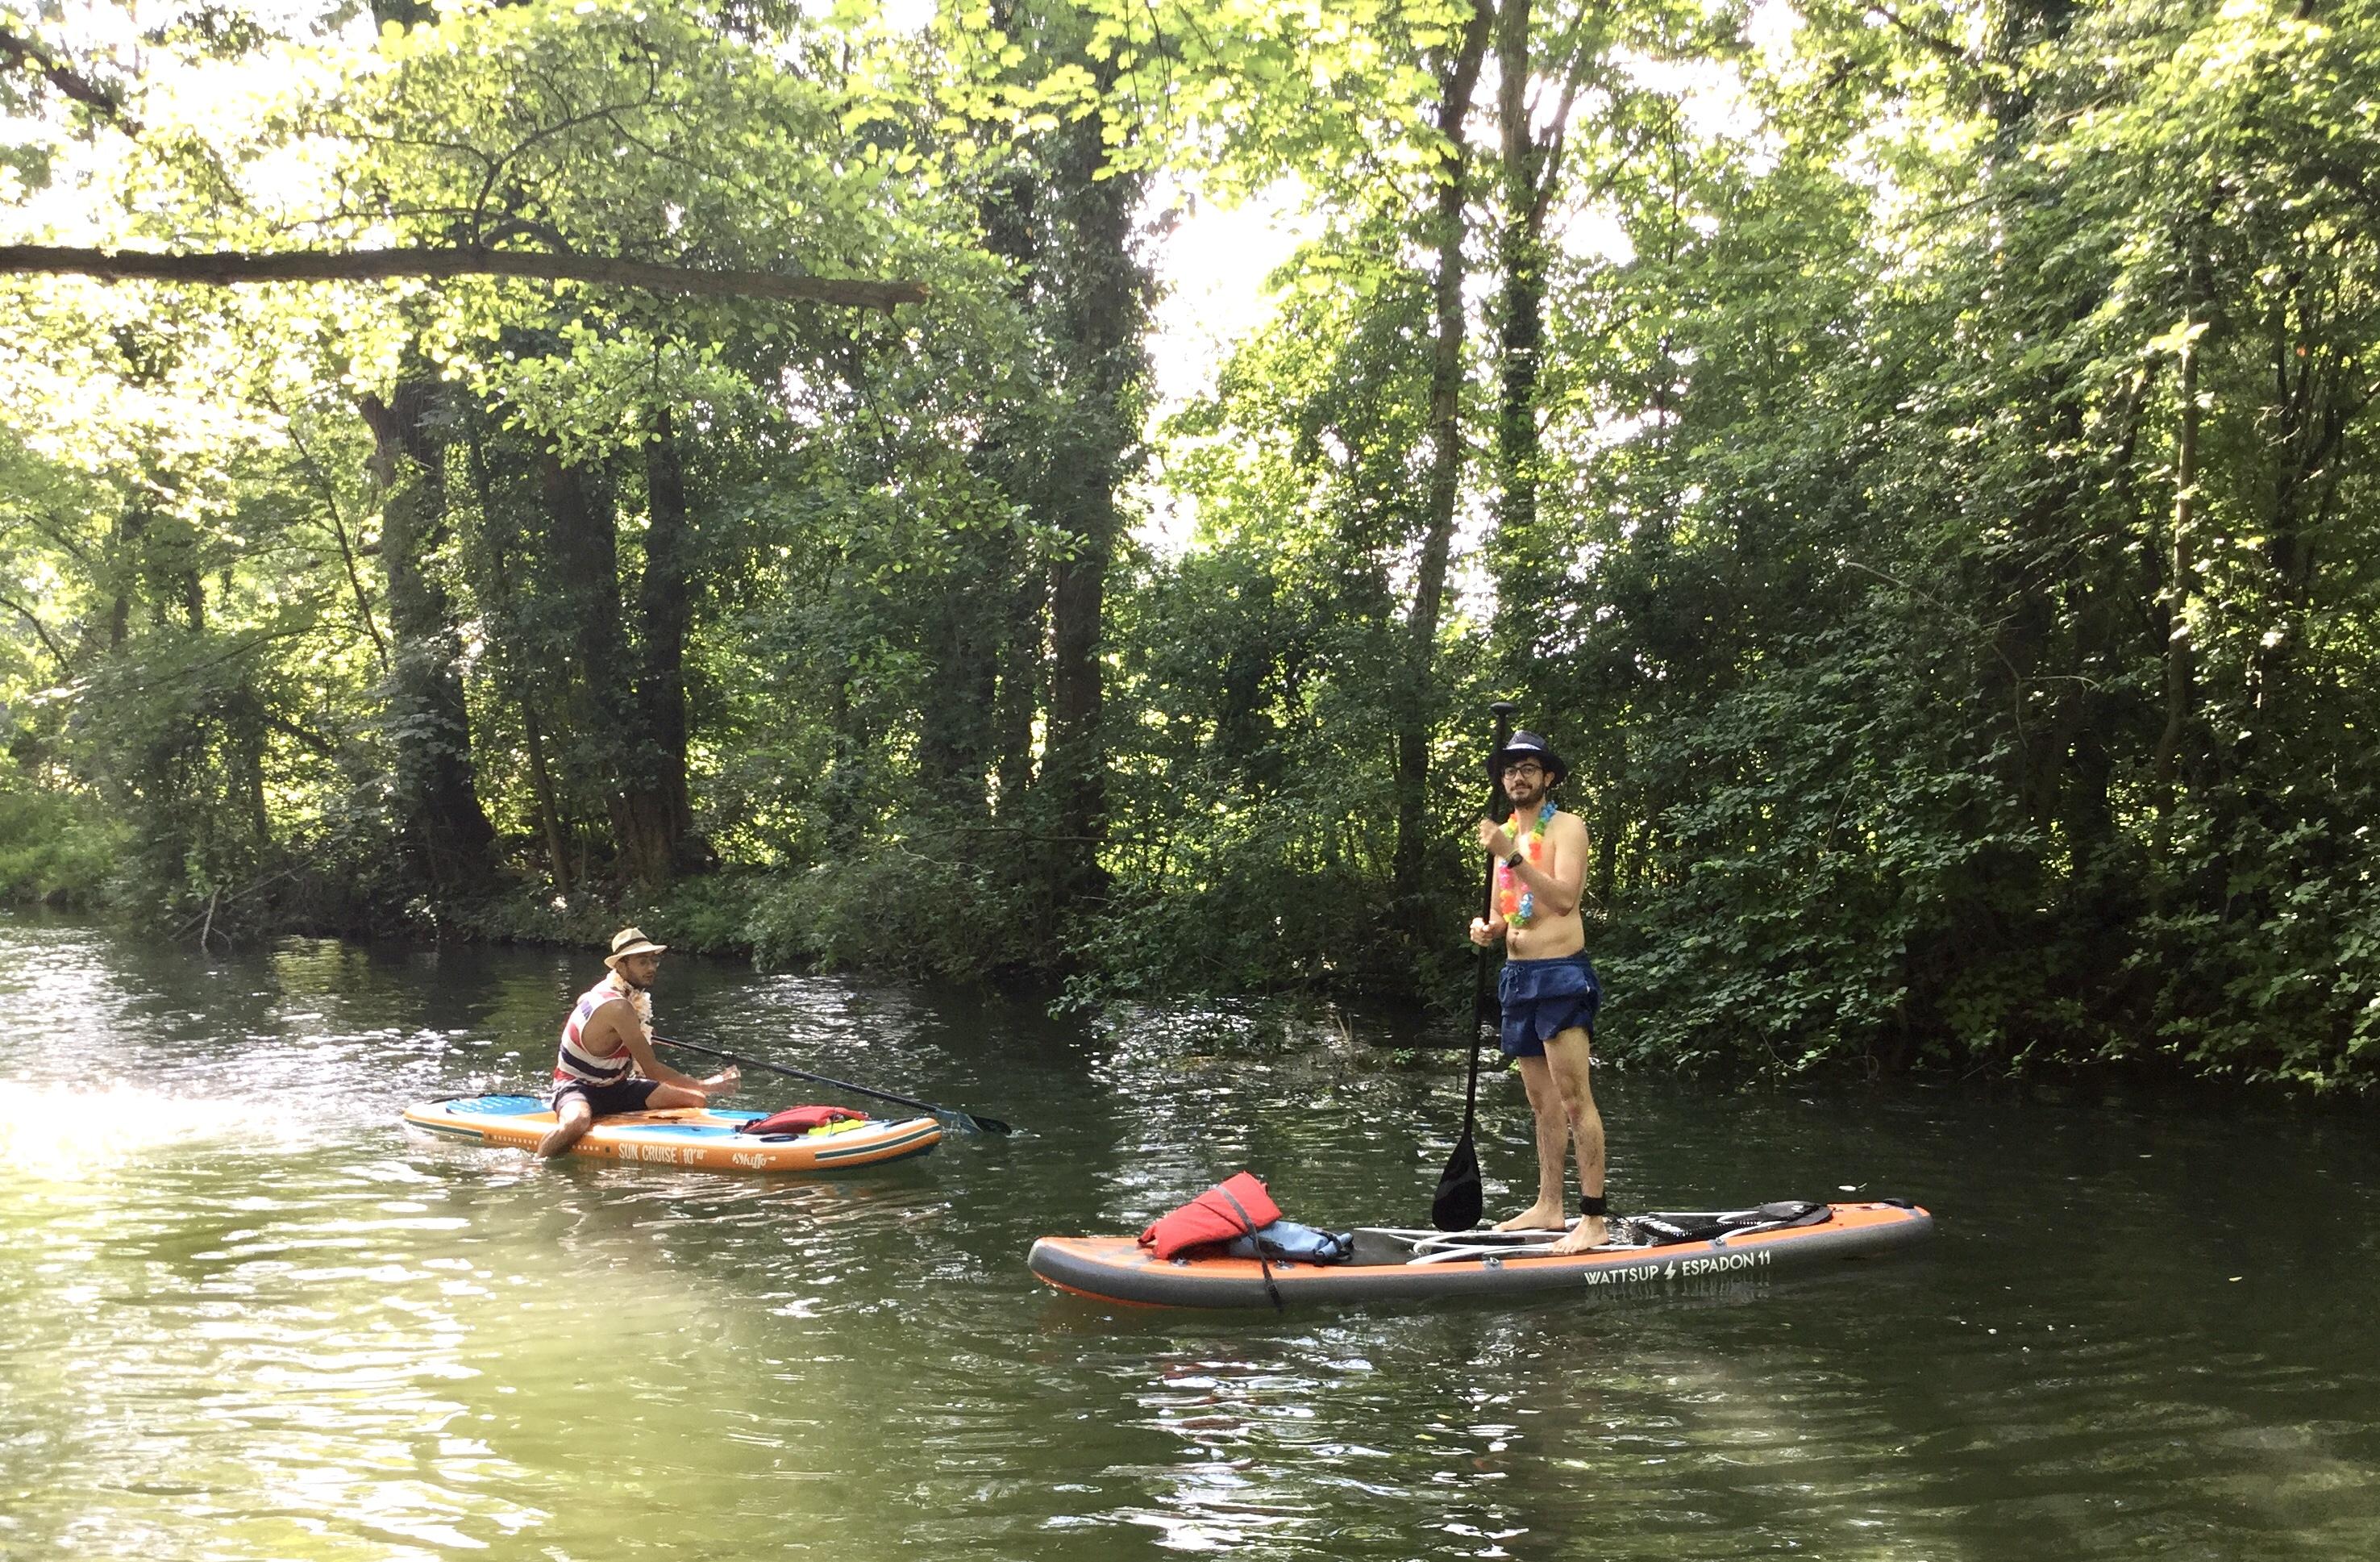 Balade sur le Rhin Tortu en Paddle